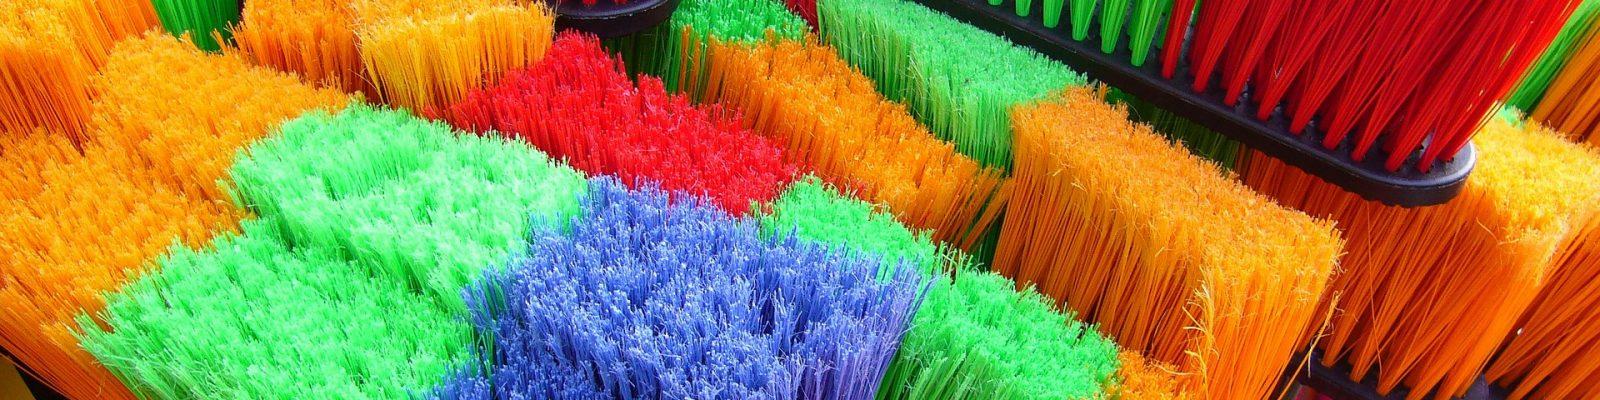 brooms-57256_1920